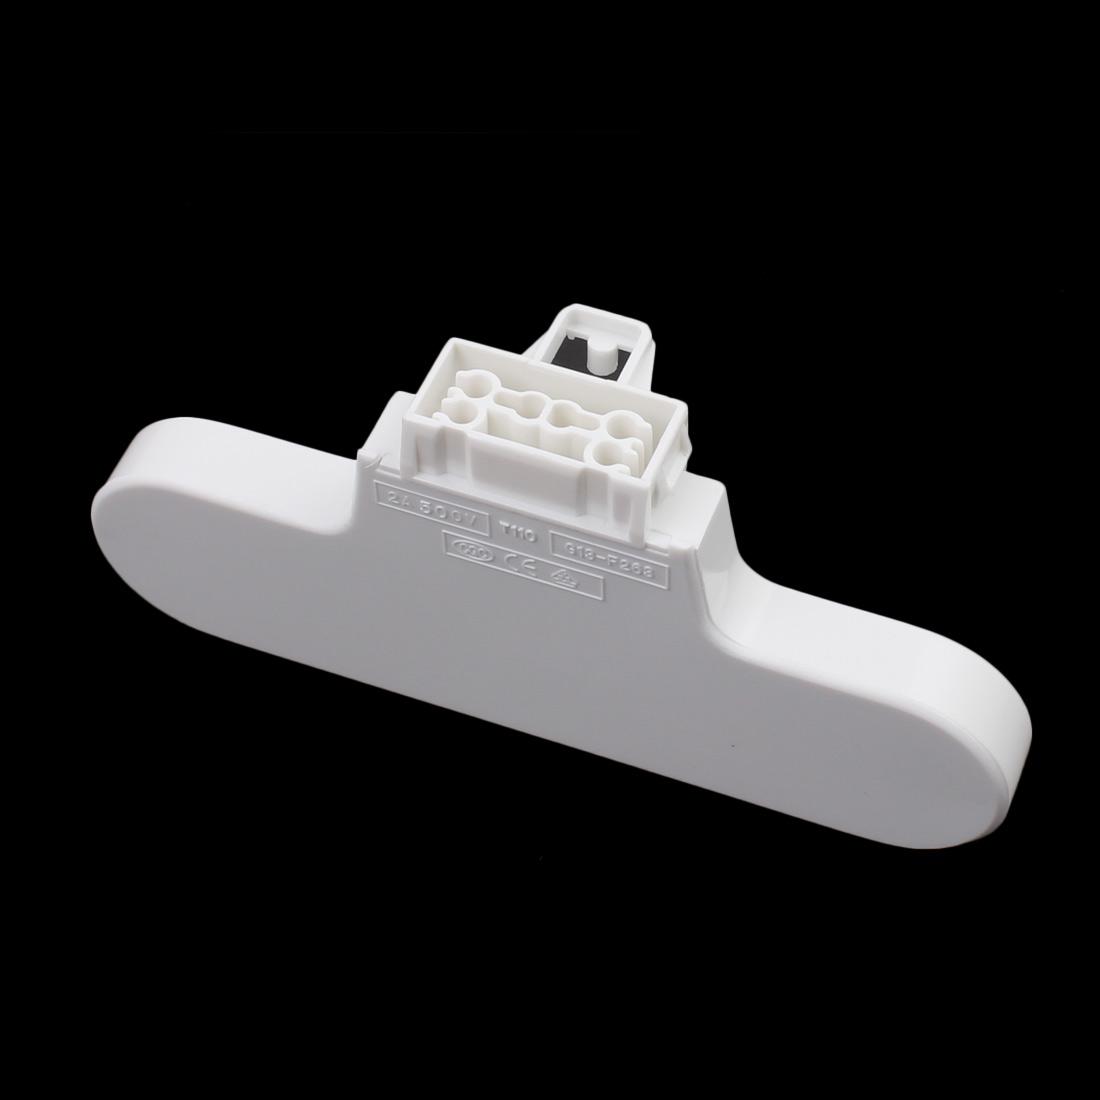 7Pcs AC500V 2A G13-F263B T8 Double Light Socket G13 Base Fluorescent Lamp Holder - image 2 of 3